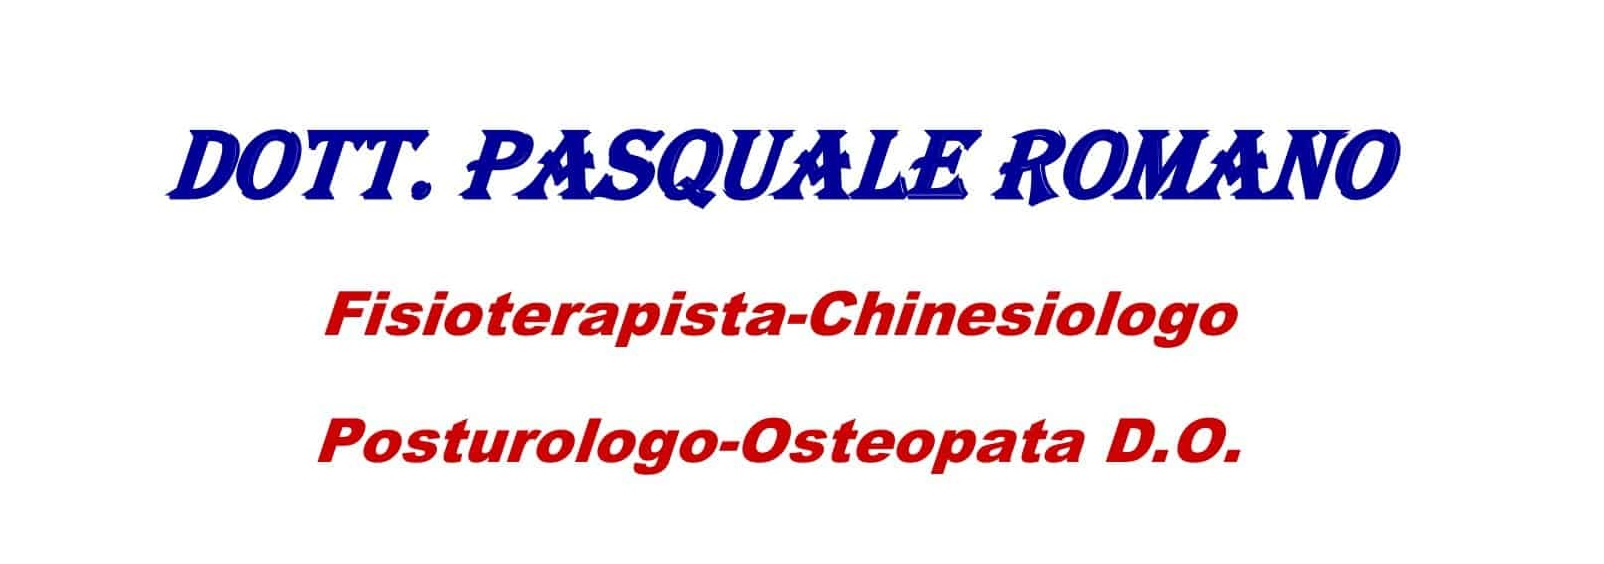 Dr. Pasquale Romano